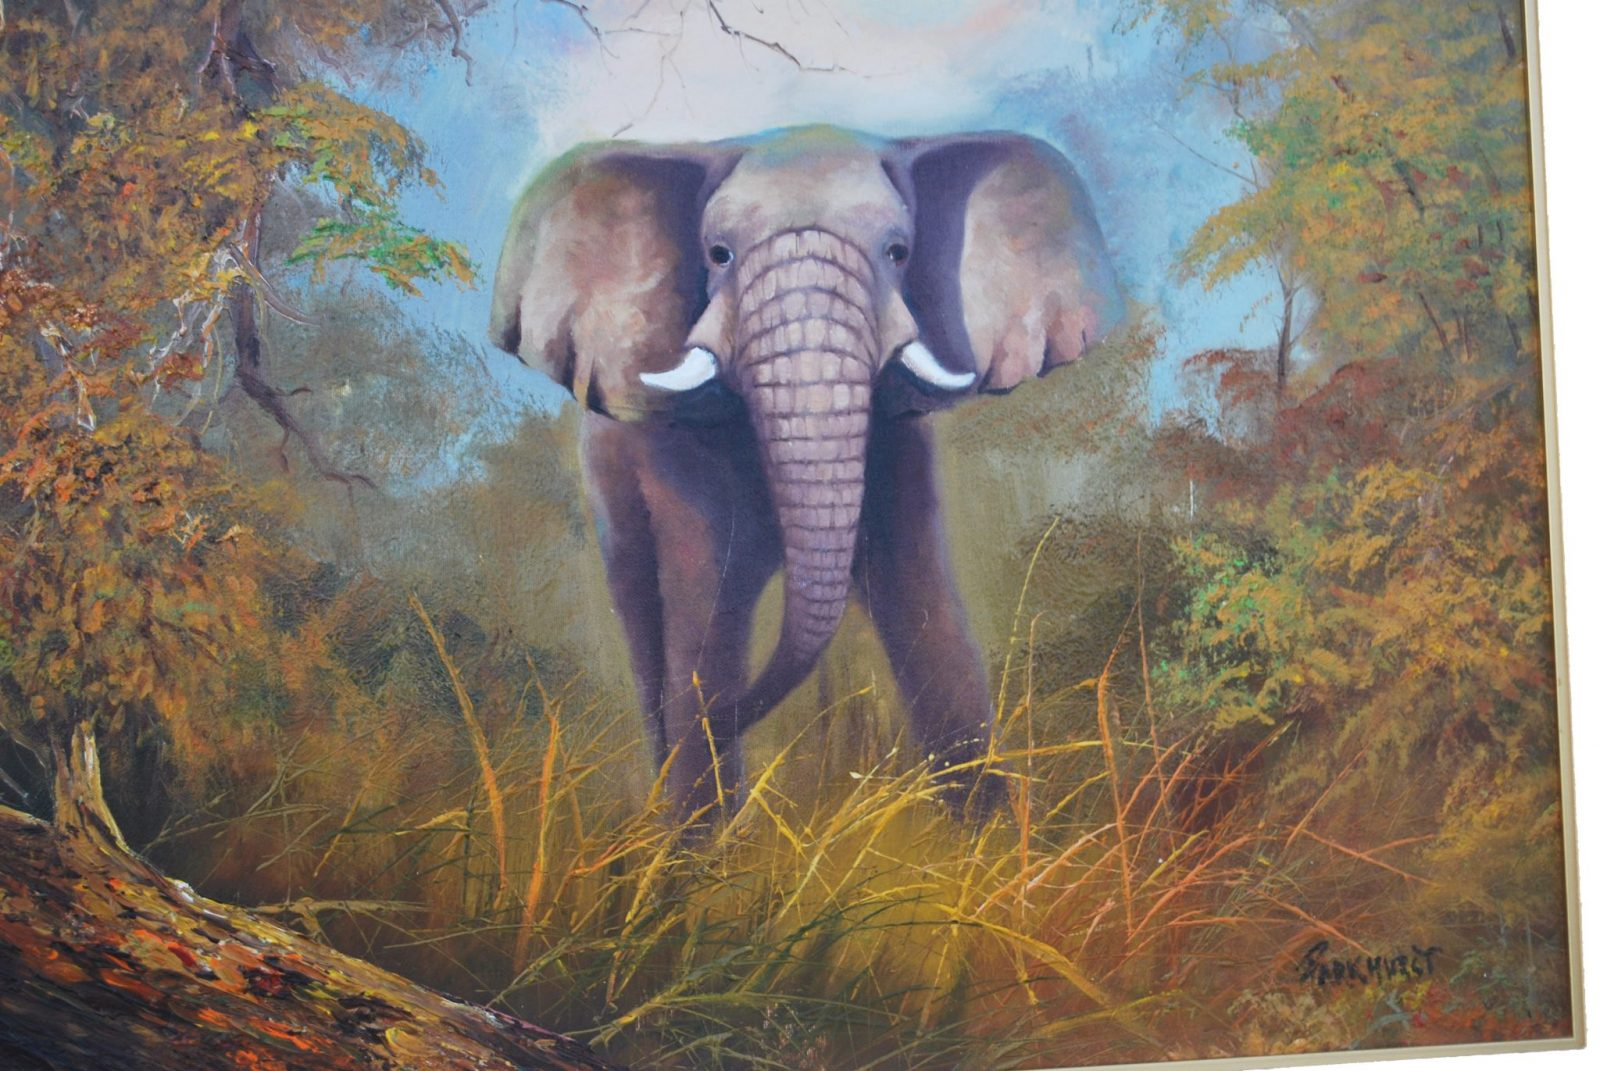 Original Oil Painting By Violet Parkhurst